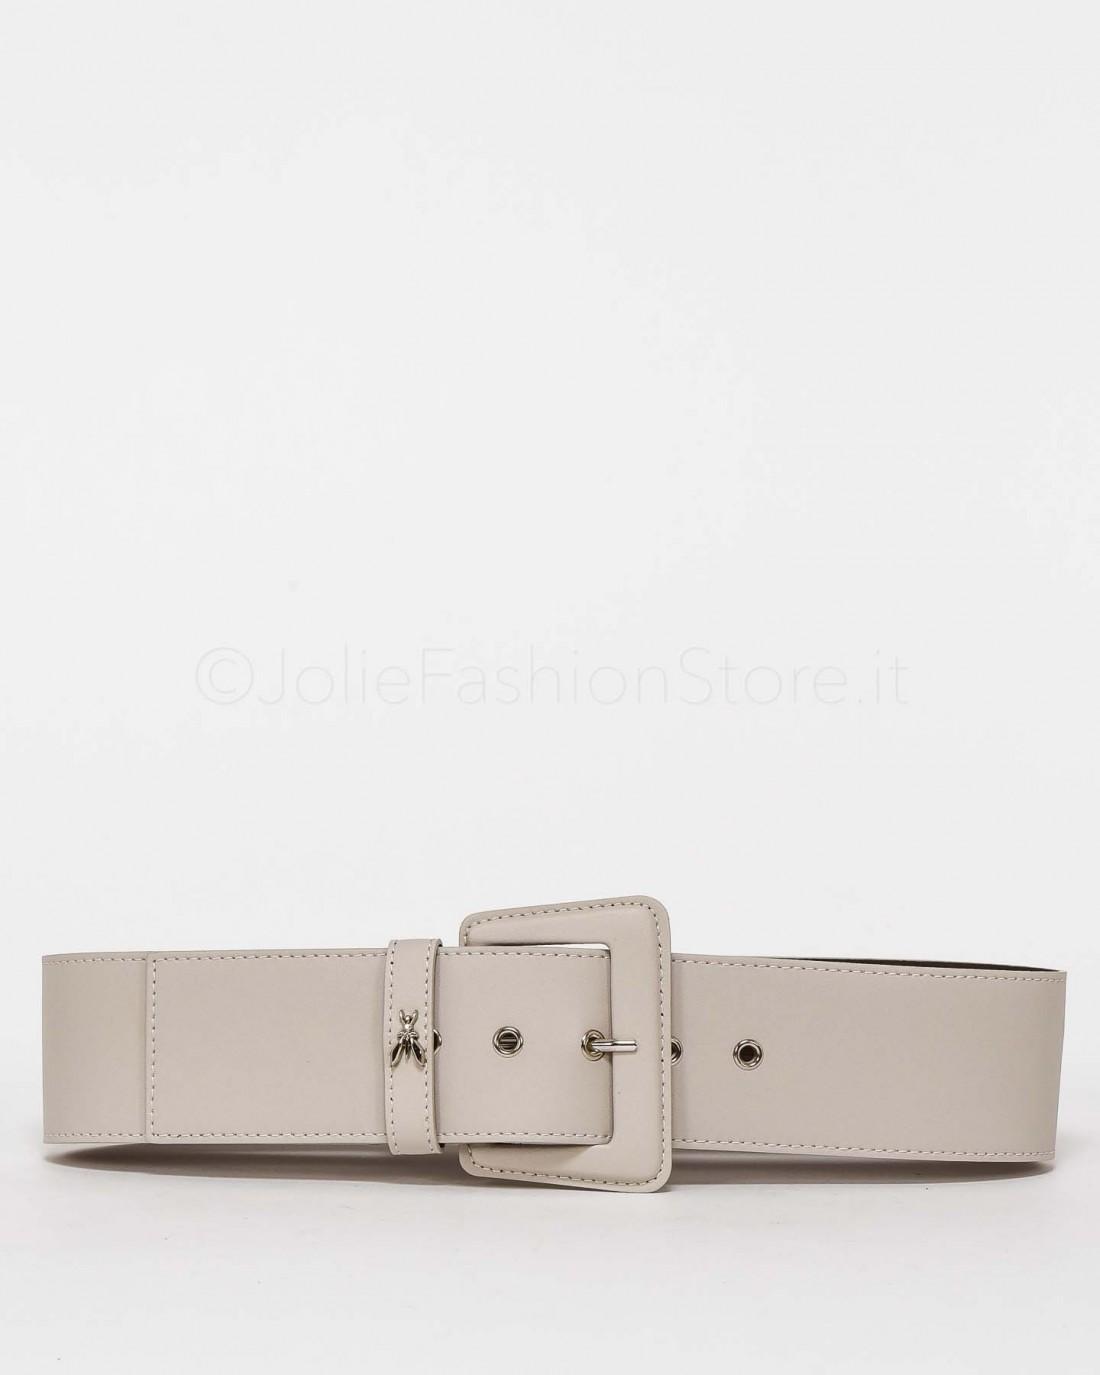 Patrizia Pepe Cintura Ice Grey  2V8783-A8W9-S619